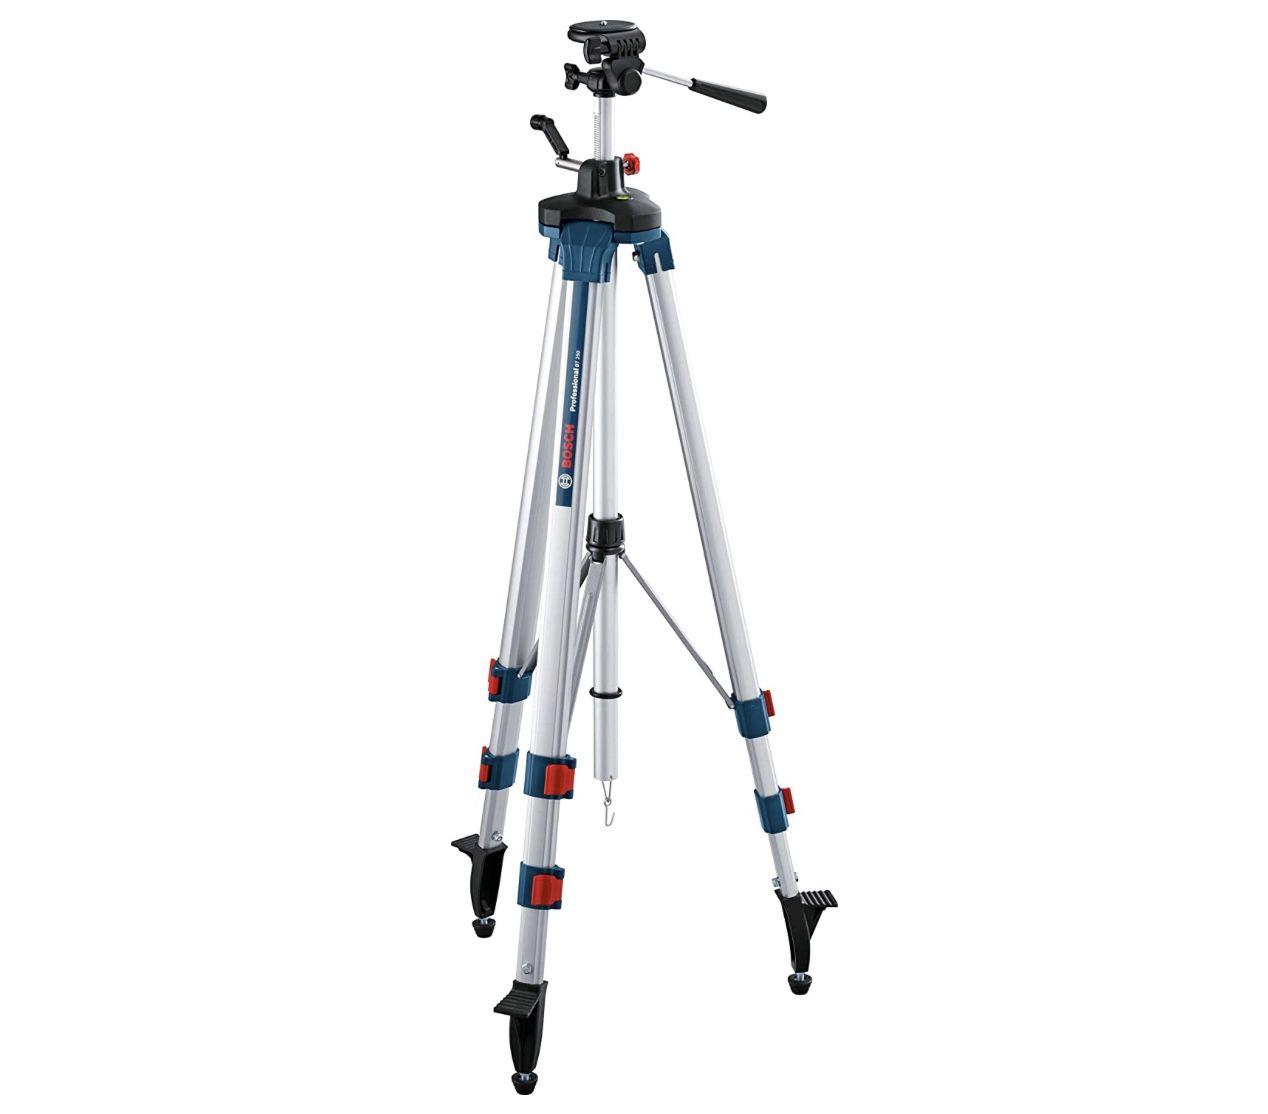 Bosch Professional Baustativ BT 250 für 59,24€ (statt 80€)